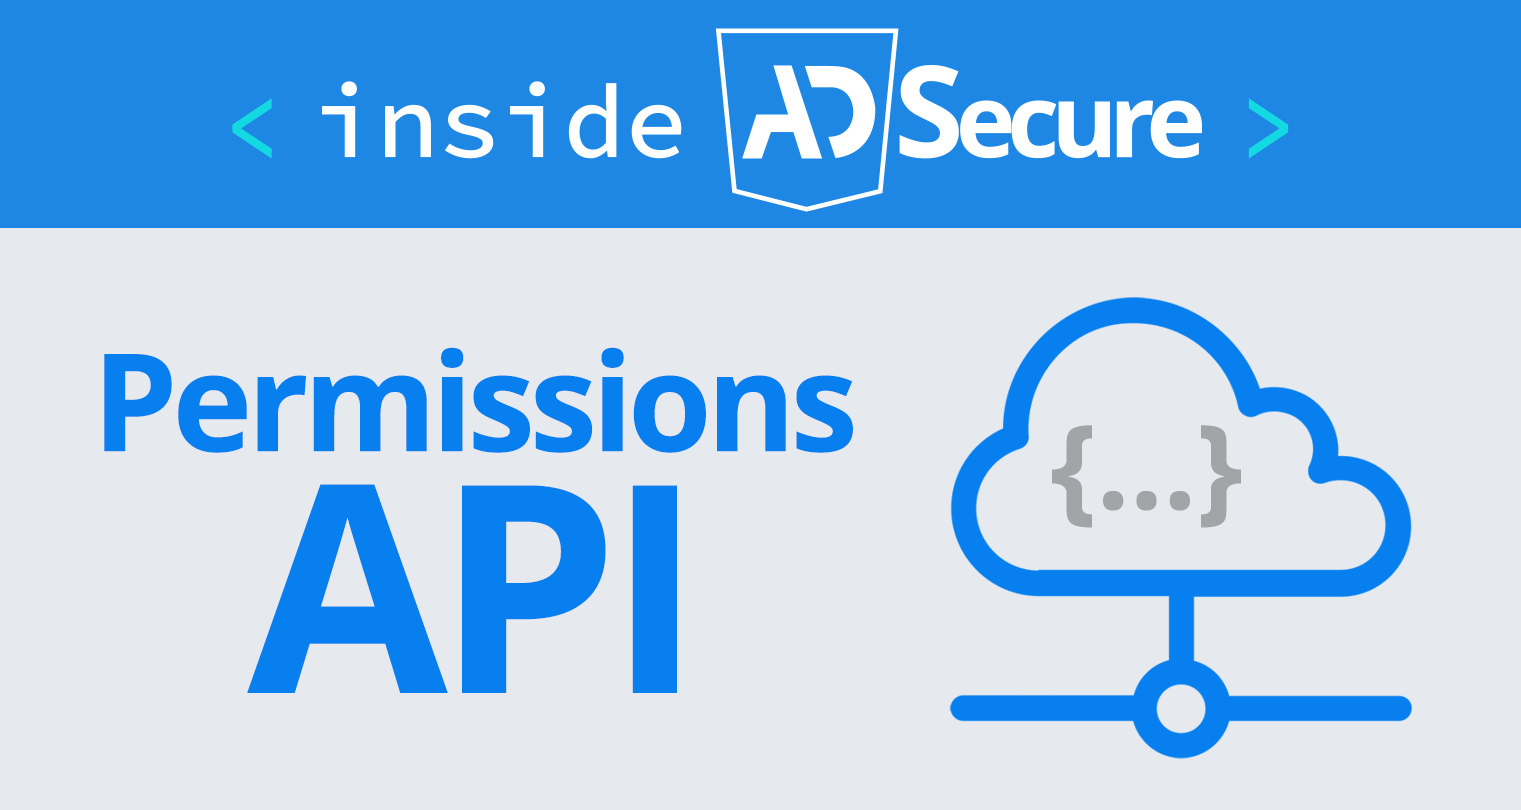 Permissions API AdSecure